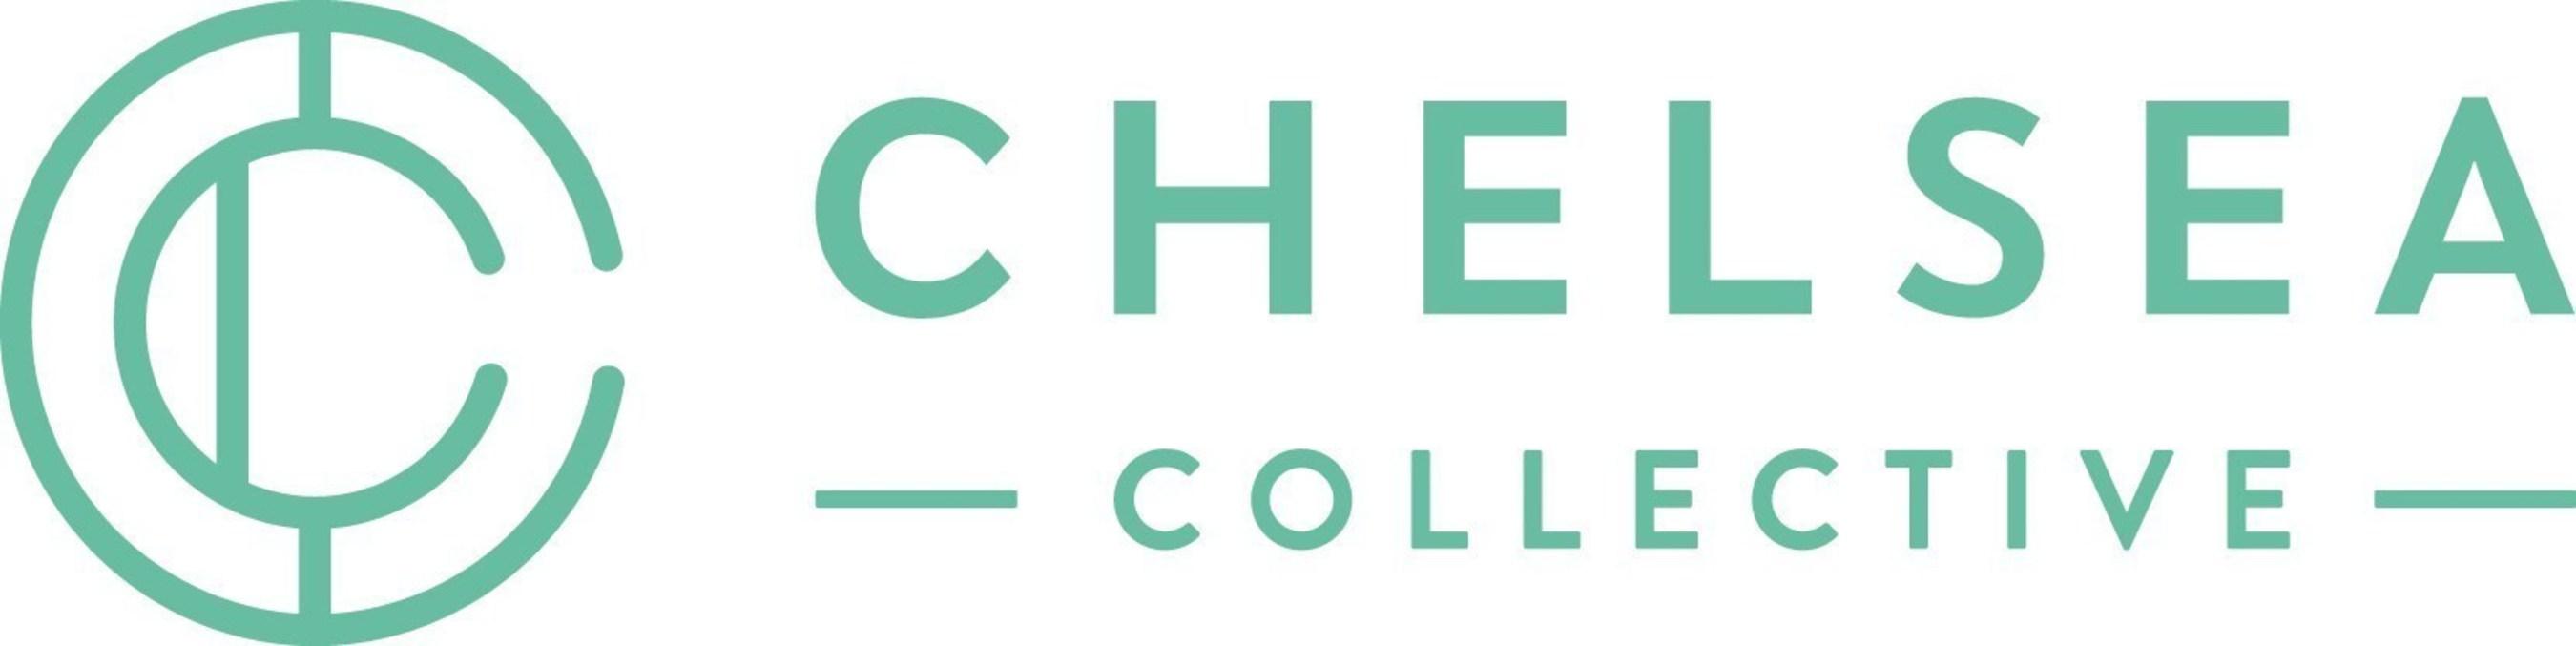 Chelsea Collective logo